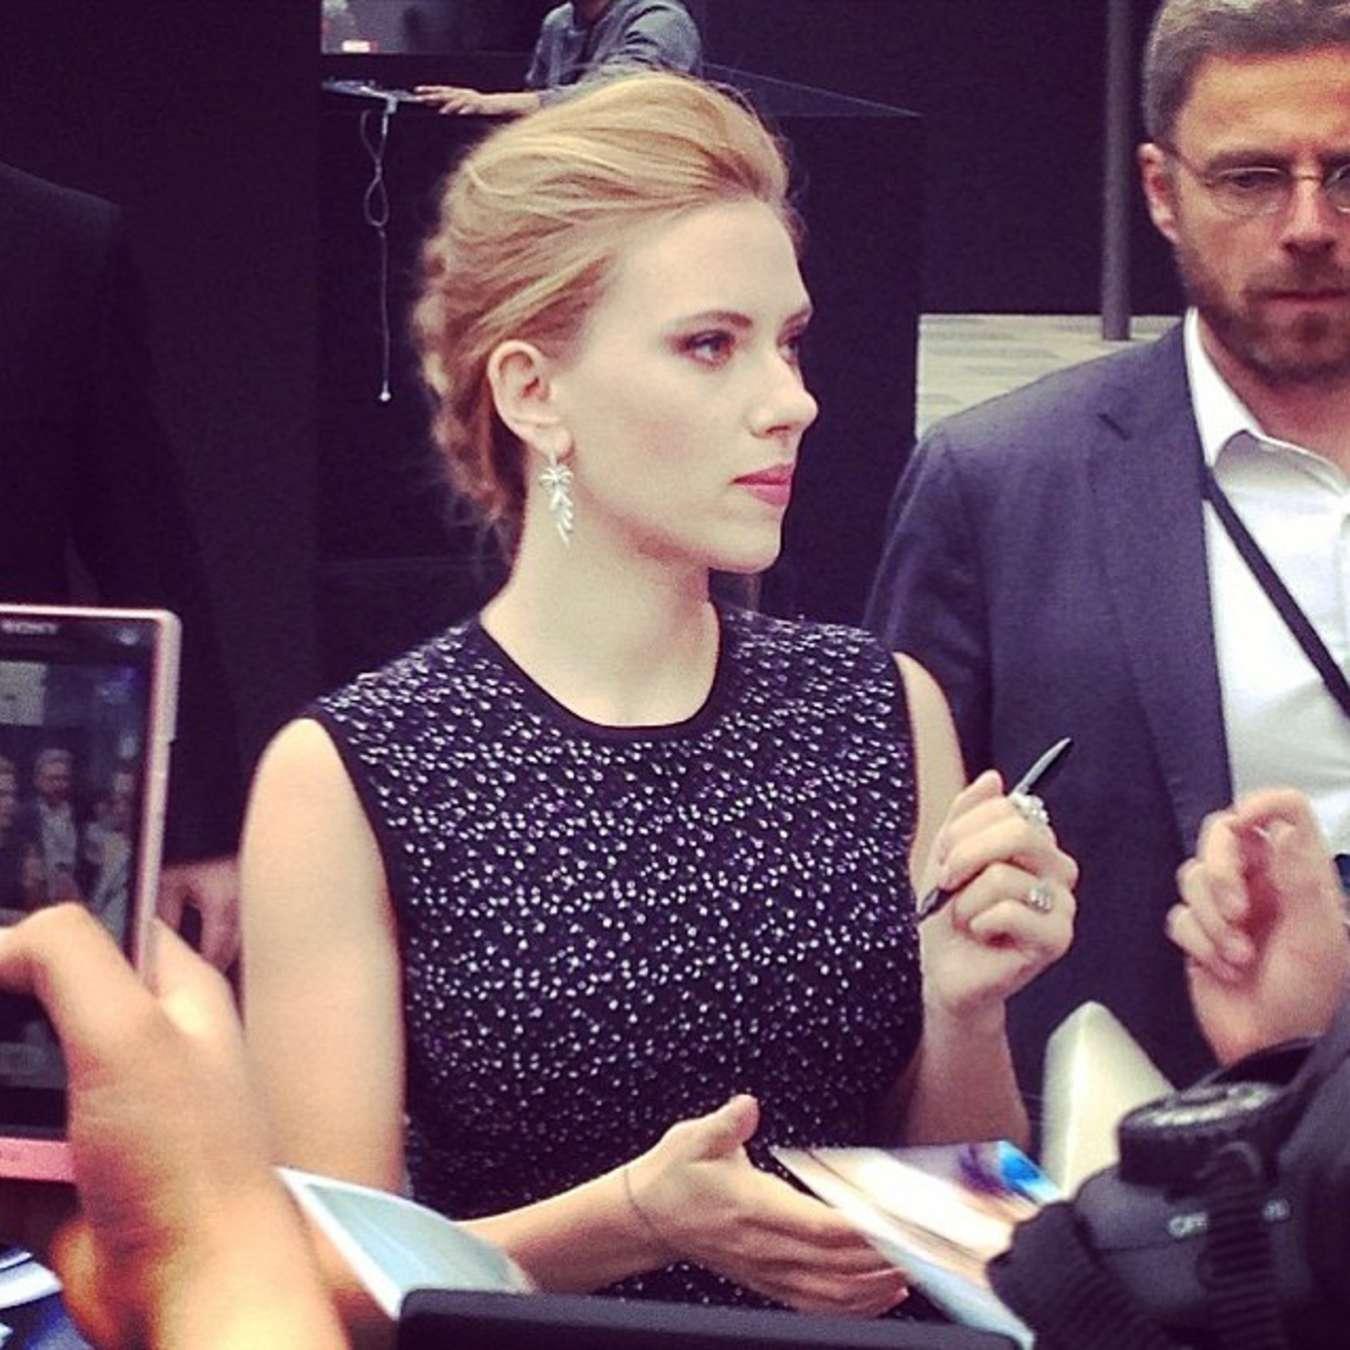 Scarlett Johansson 2014 : Scarlett Johansson: Captain America: The Winter Soldier premiere in Beijing -07